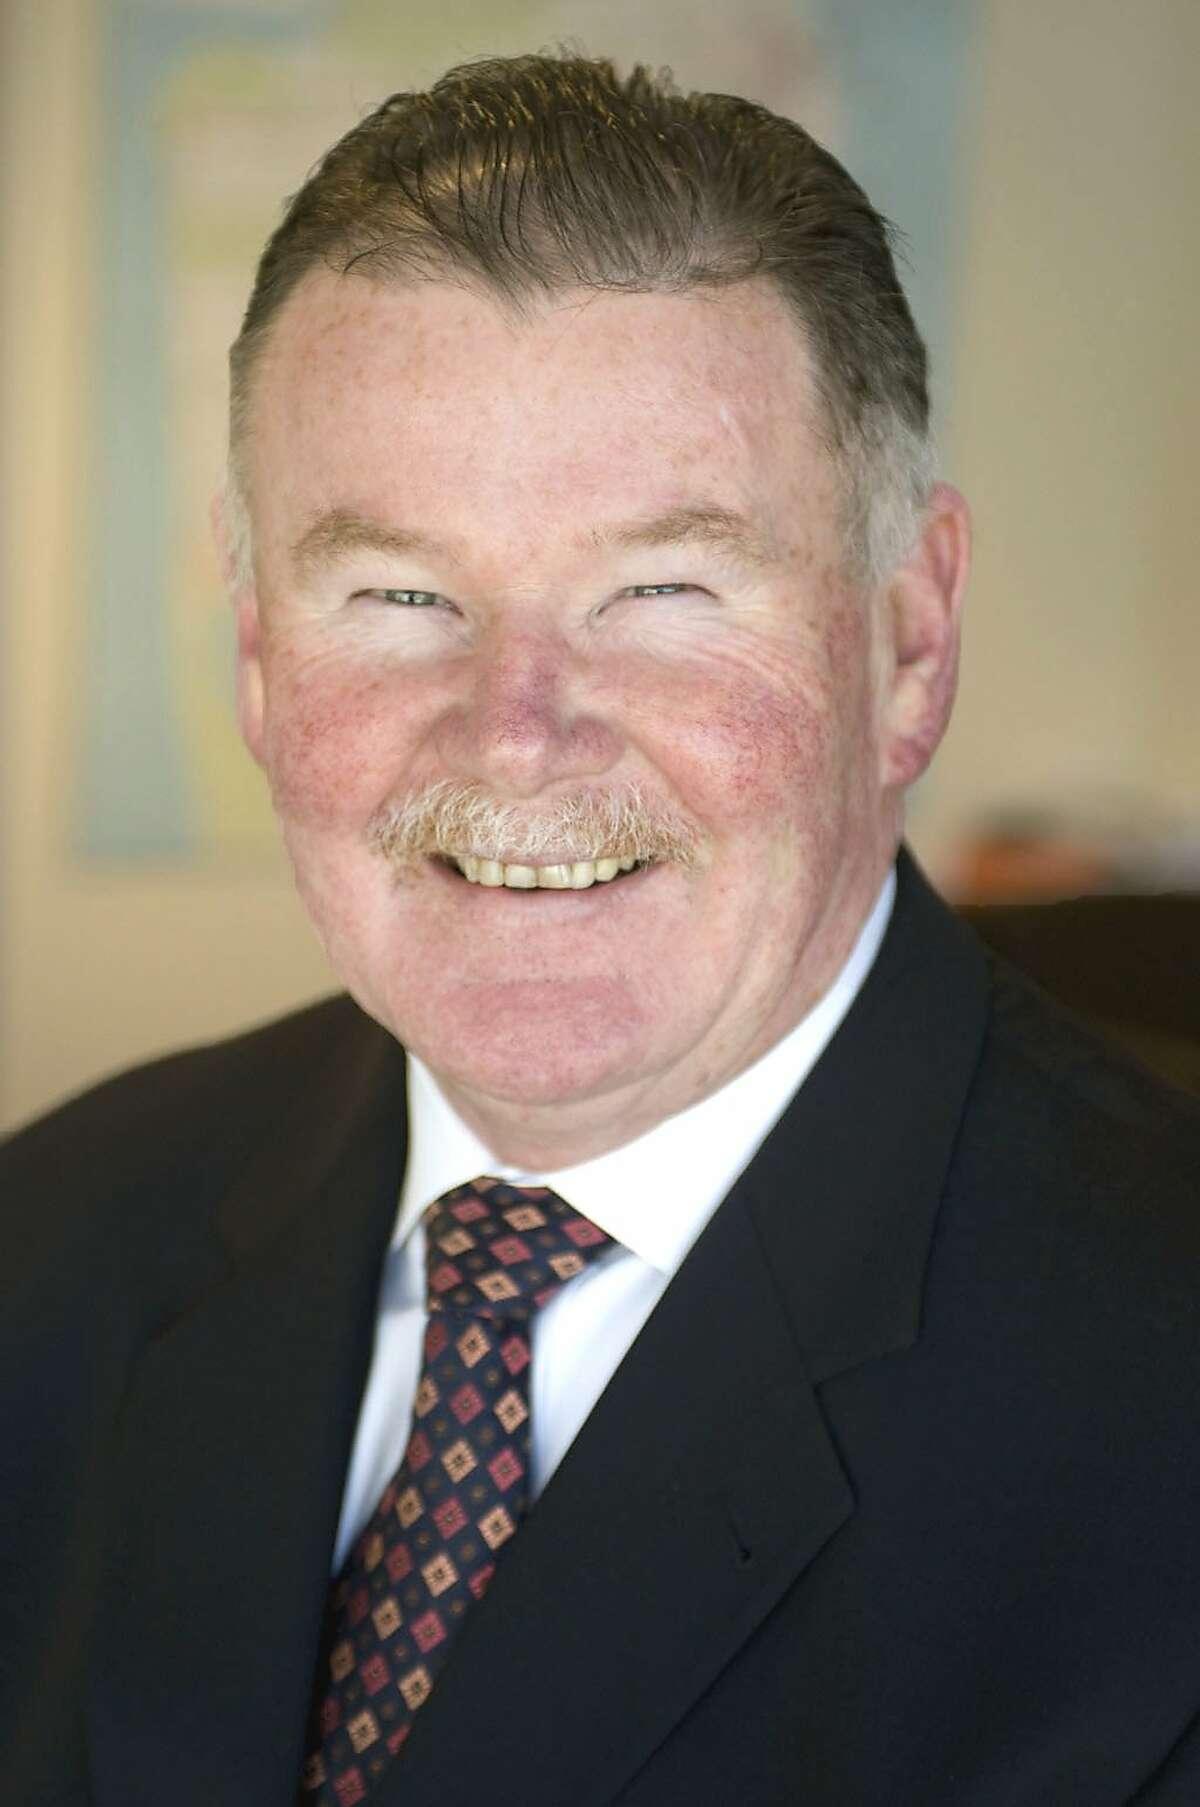 John Haley, director of transit, San Francisco Municipal Transportation Agency